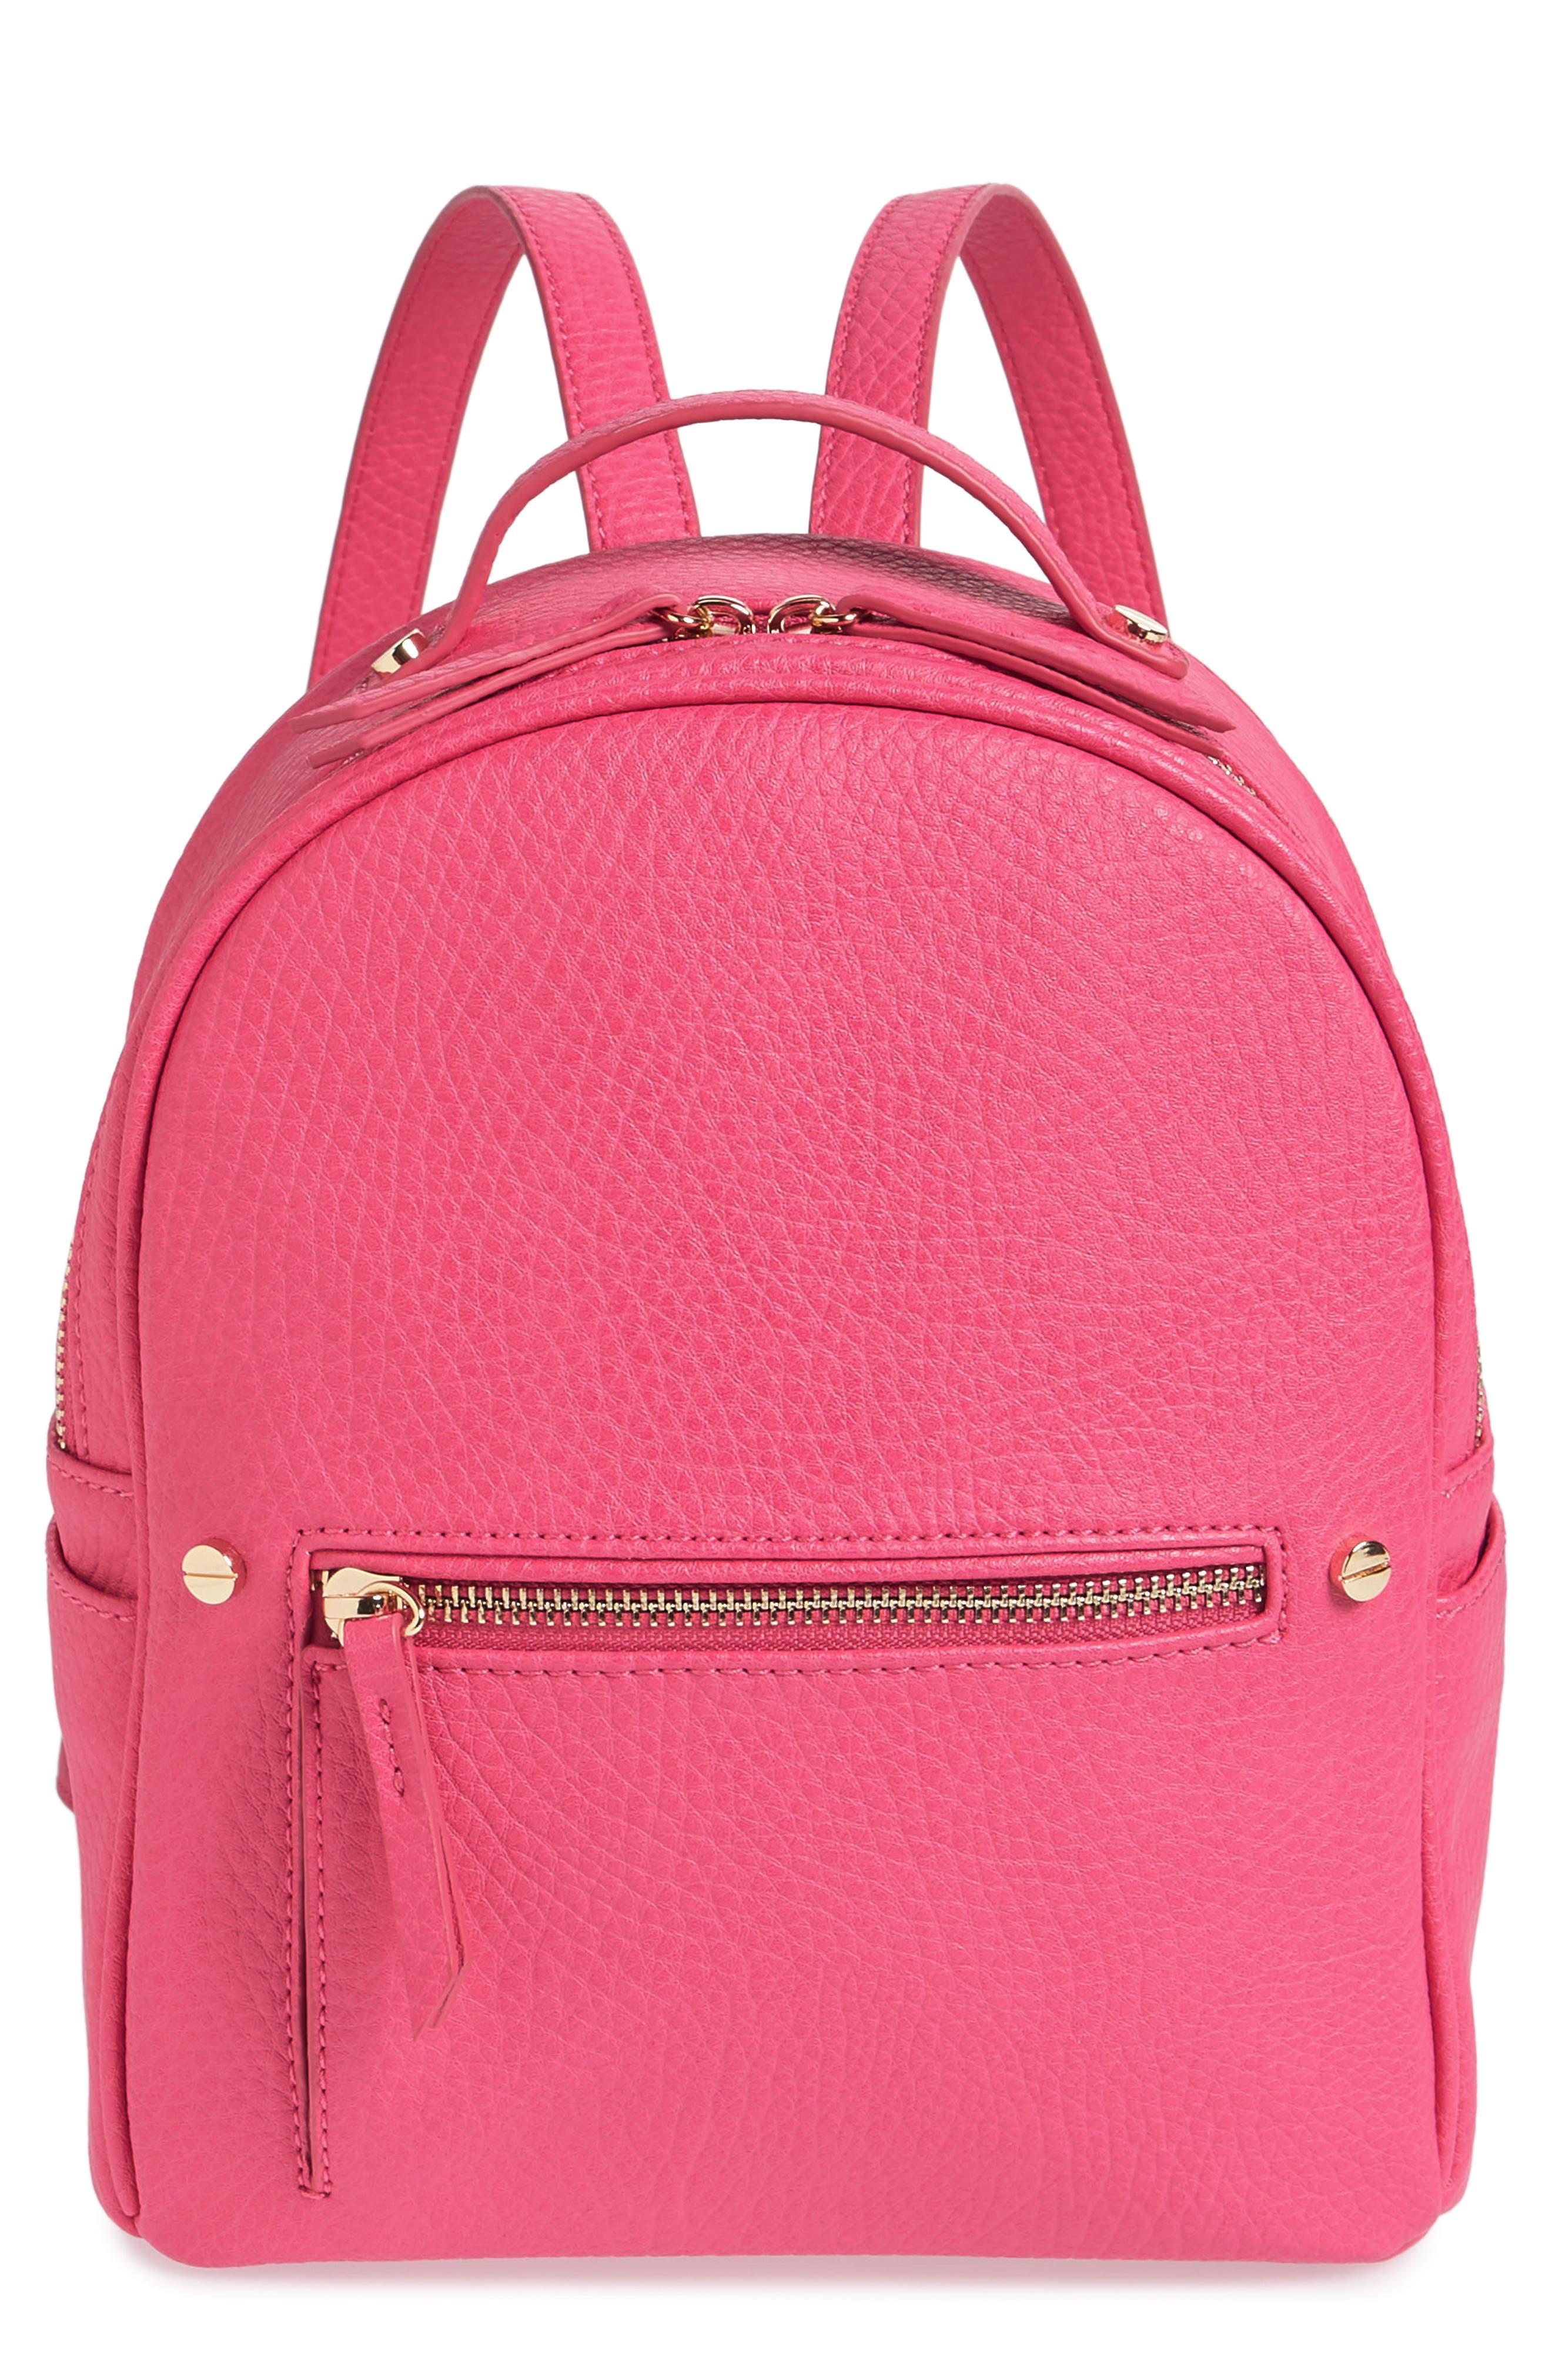 Mali + Lili Hannah Vegan Leather Backpack,                         Main,                         color, Hot Pink